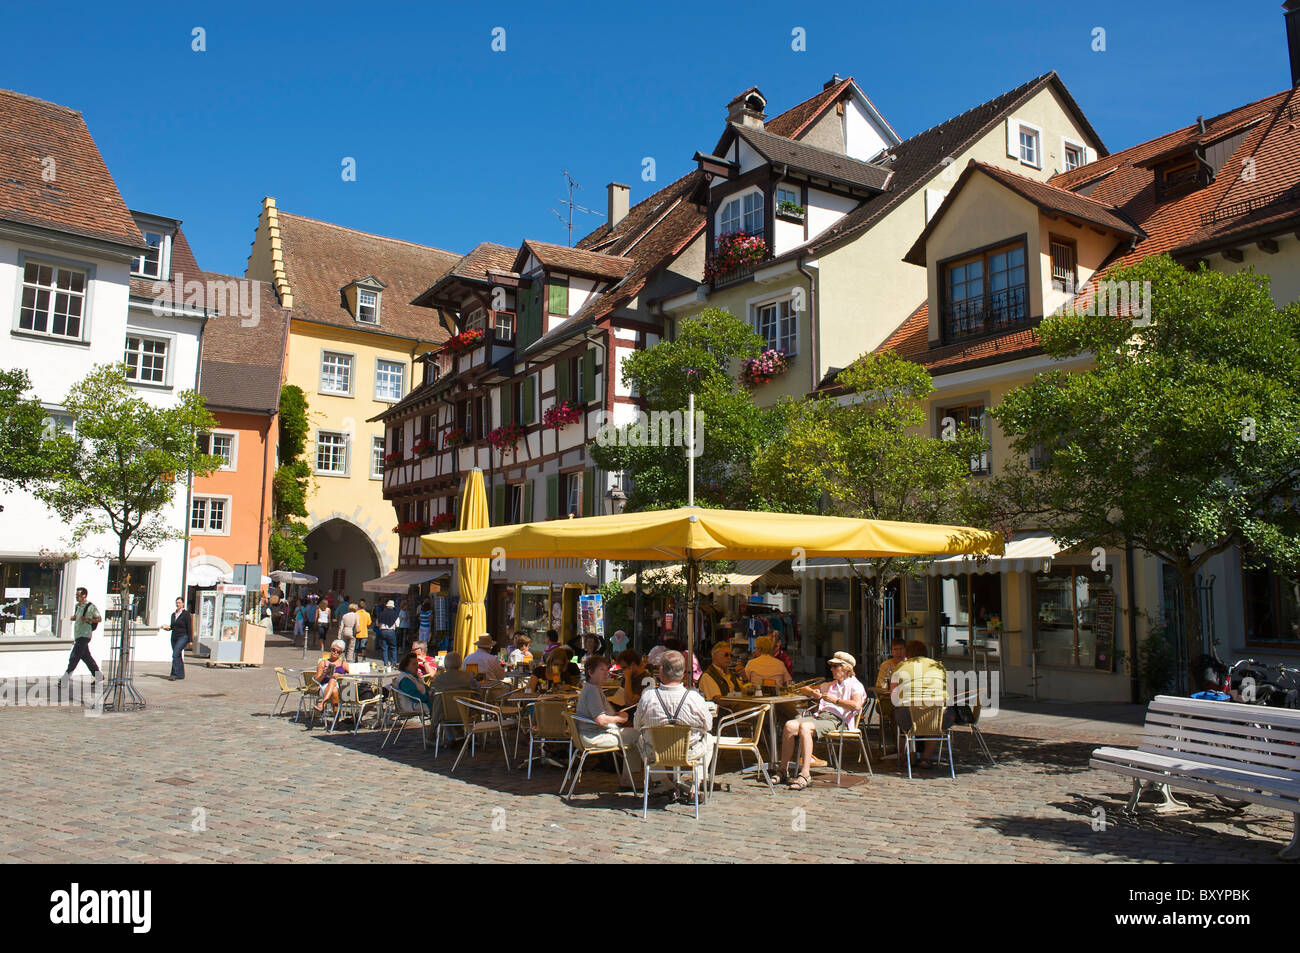 Street cafe in Meersburg, Lake Constance, Baden-Wuerttemberg, Germany - Stock Image